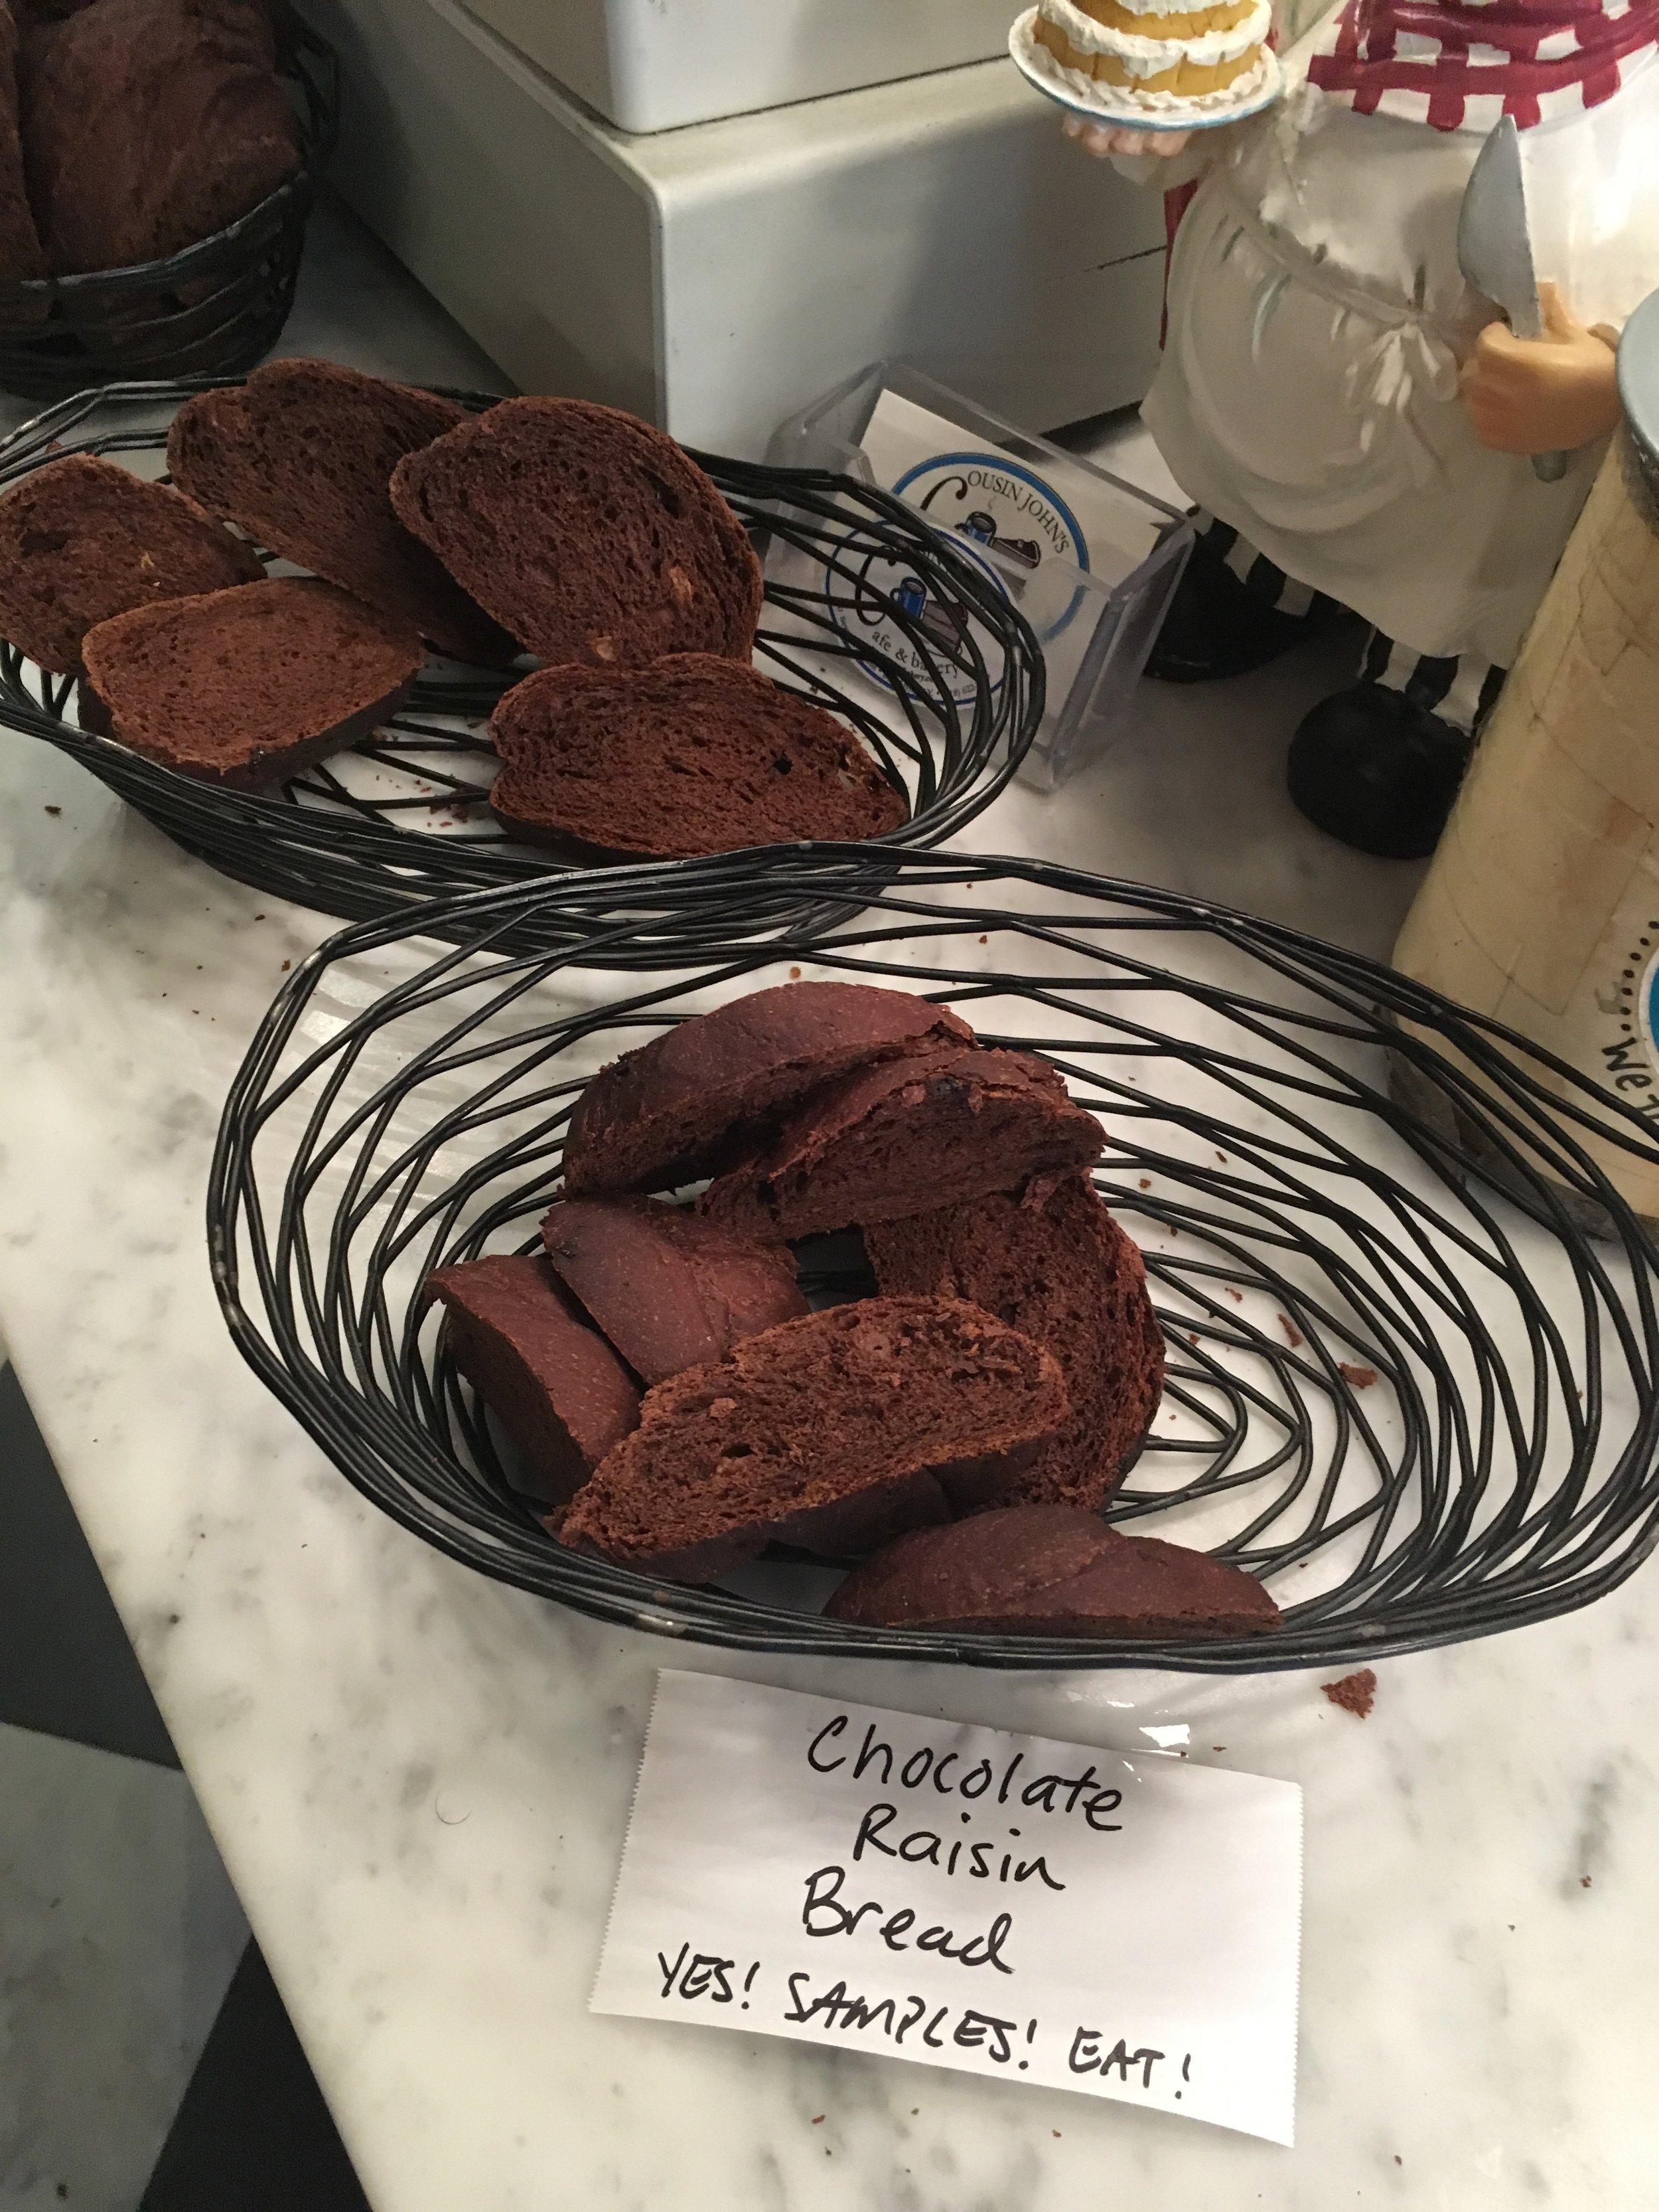 Yummy chocolate bread samples!